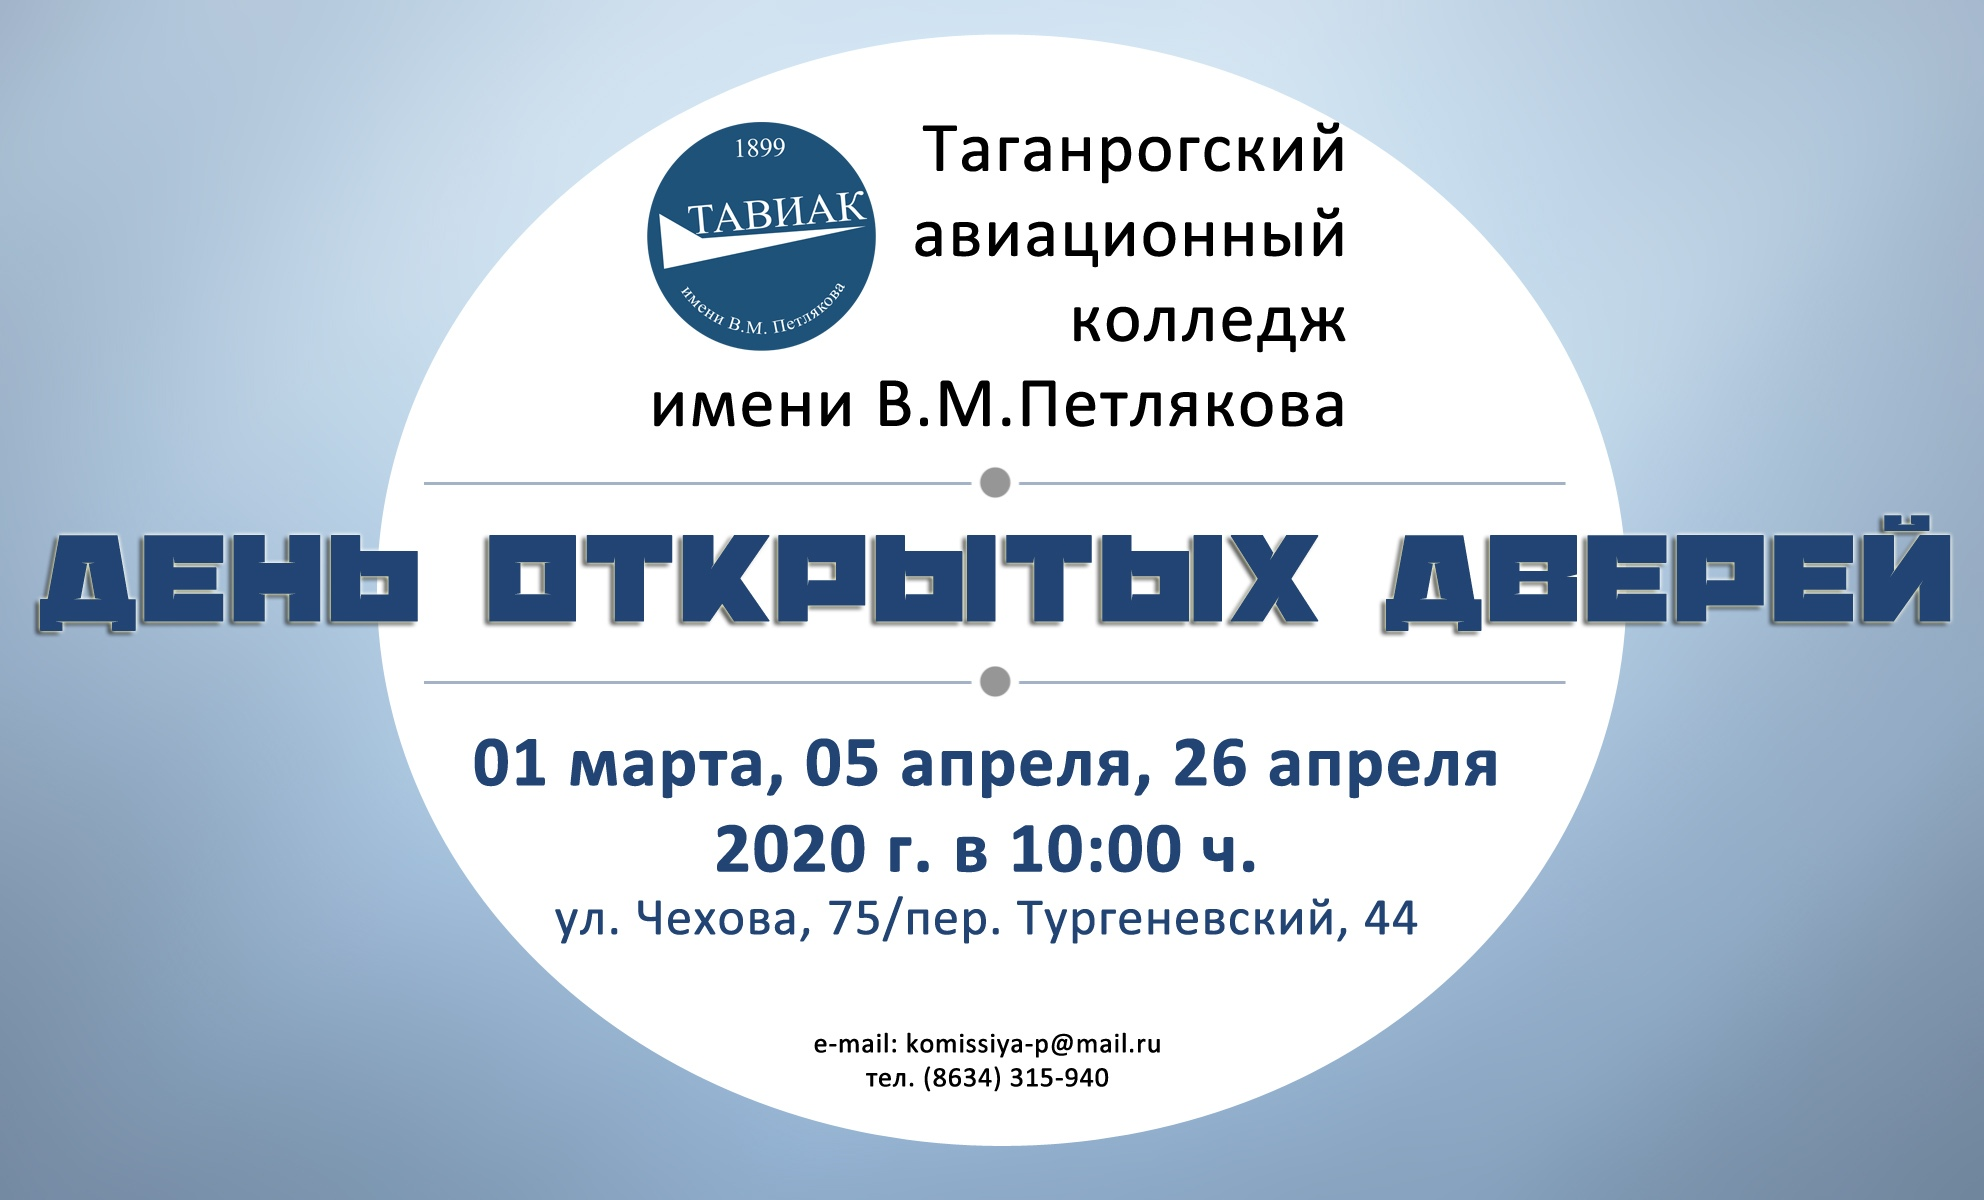 Таганрогский авиационный колледж имени В.М. Петлякова, г. Таганрог